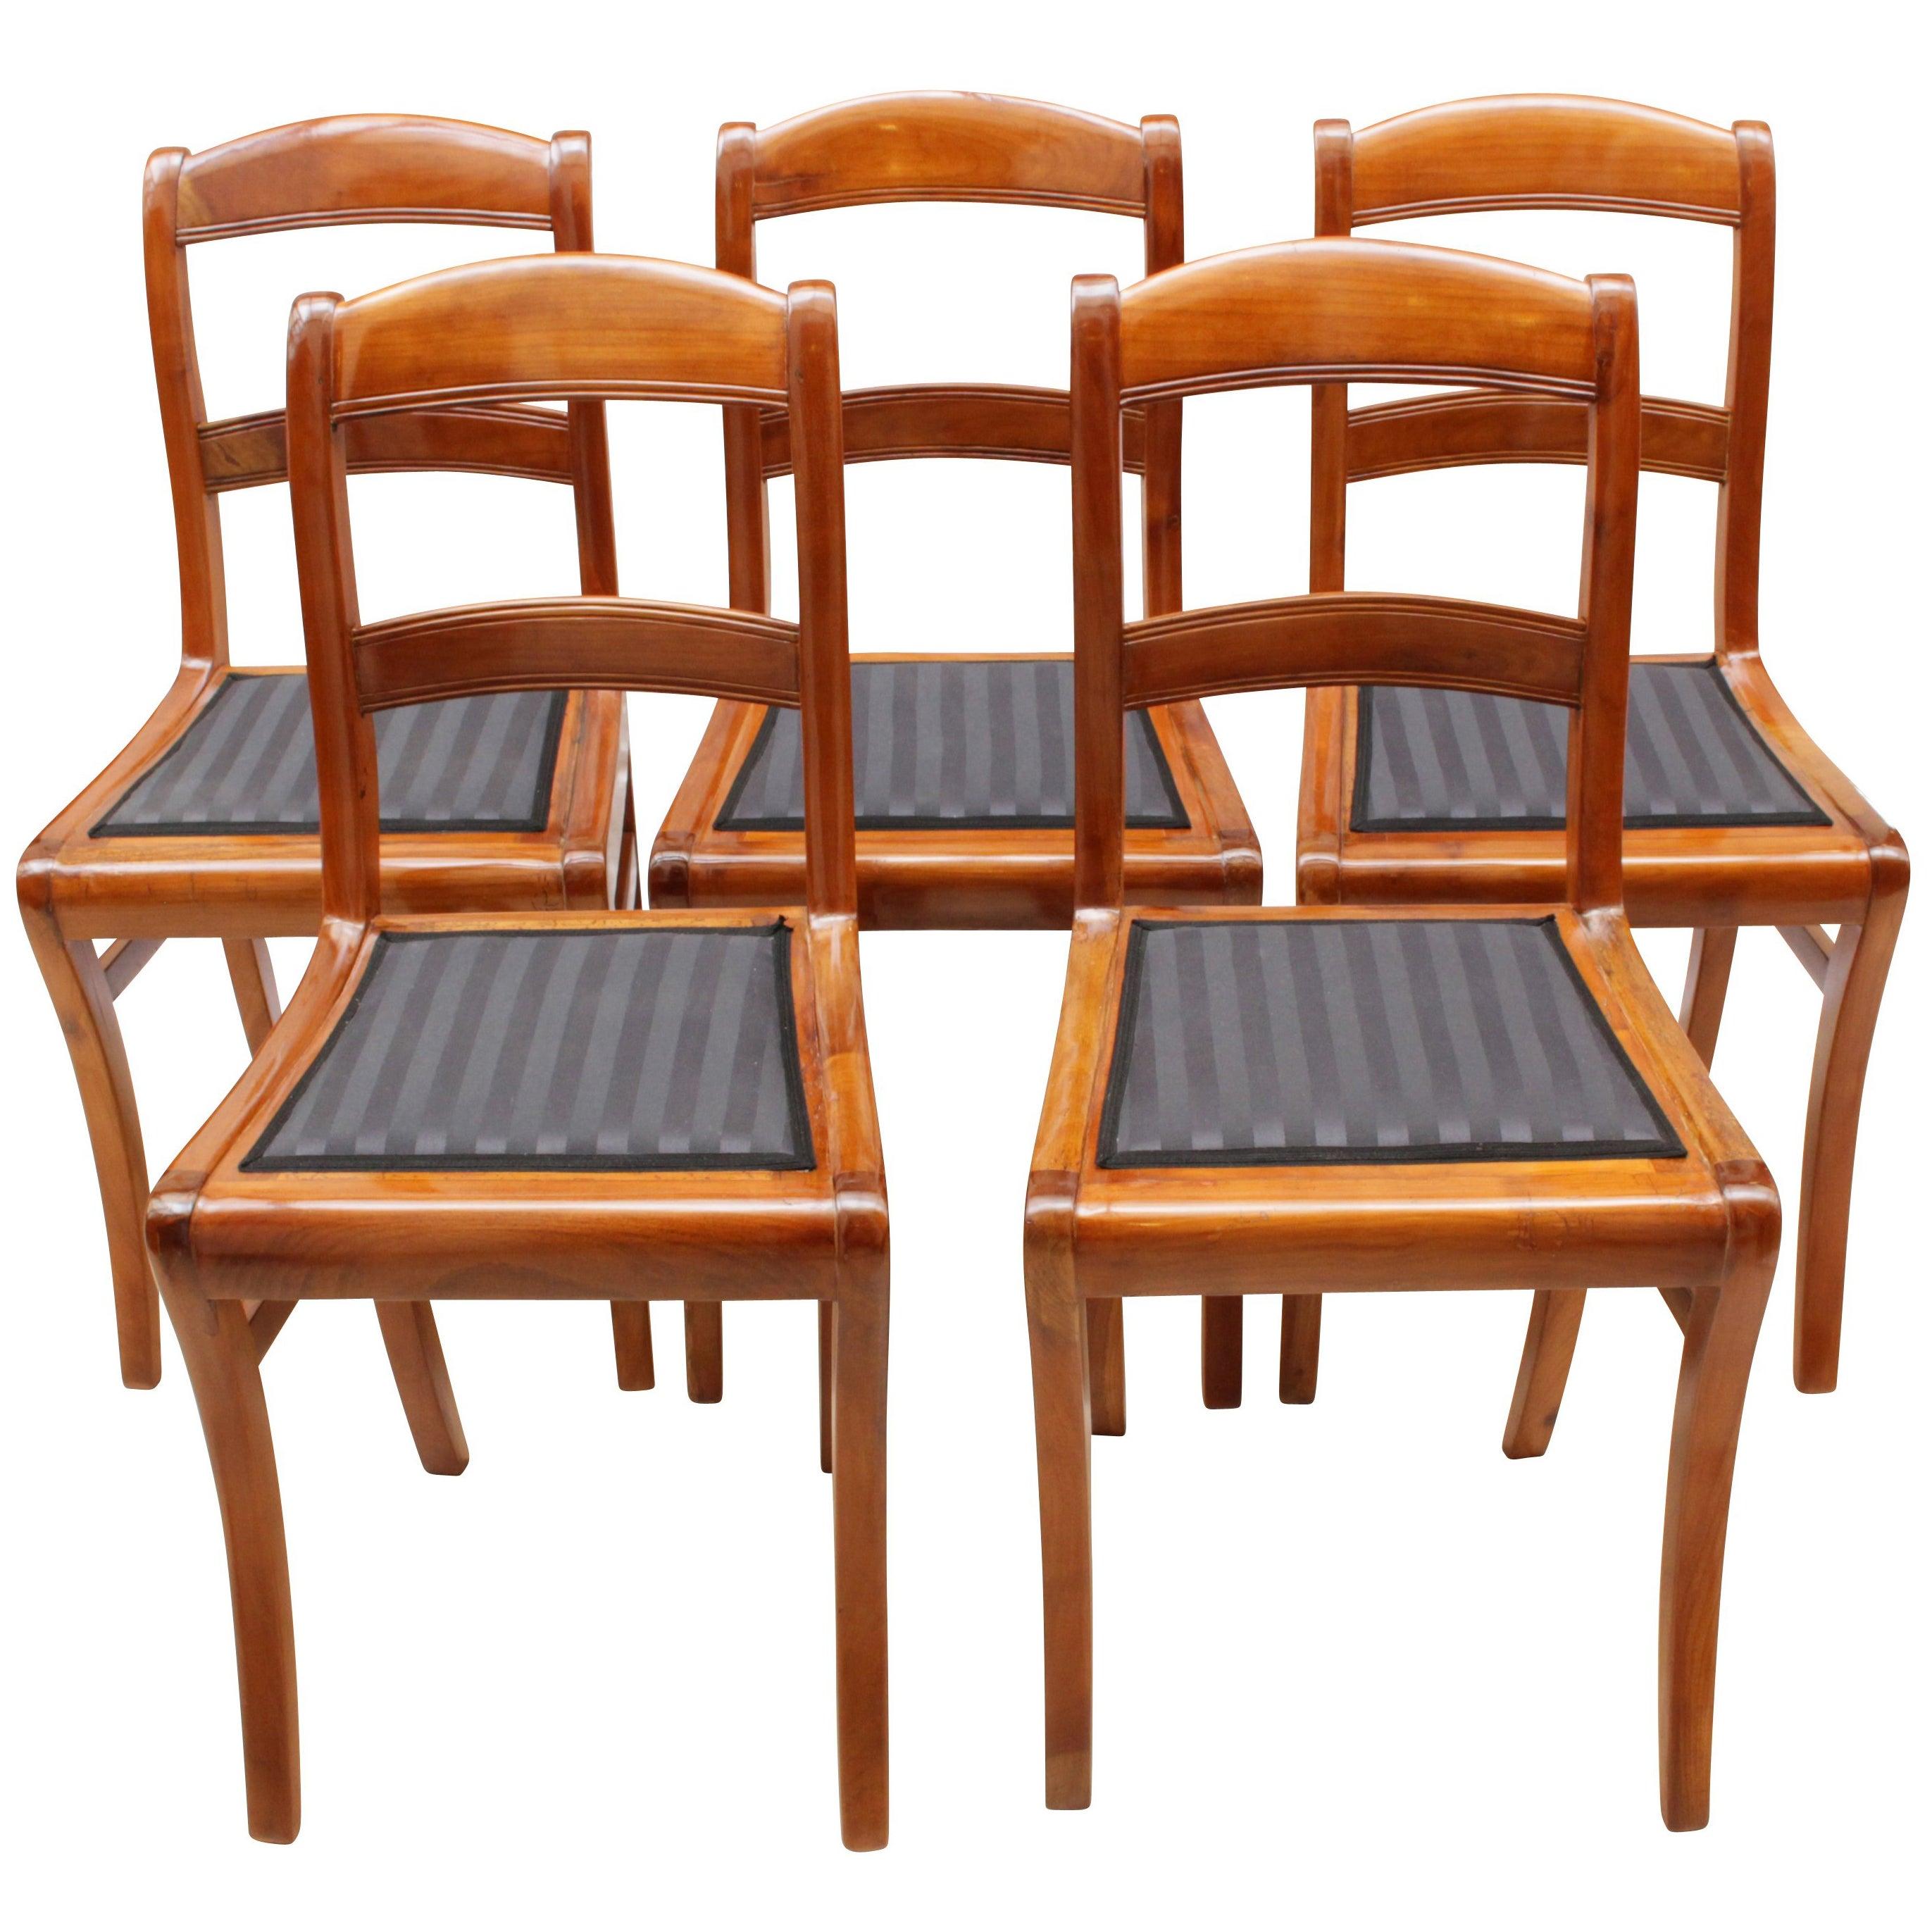 19th Century, Set of Five Solid Cherry Biedermeier Chairs